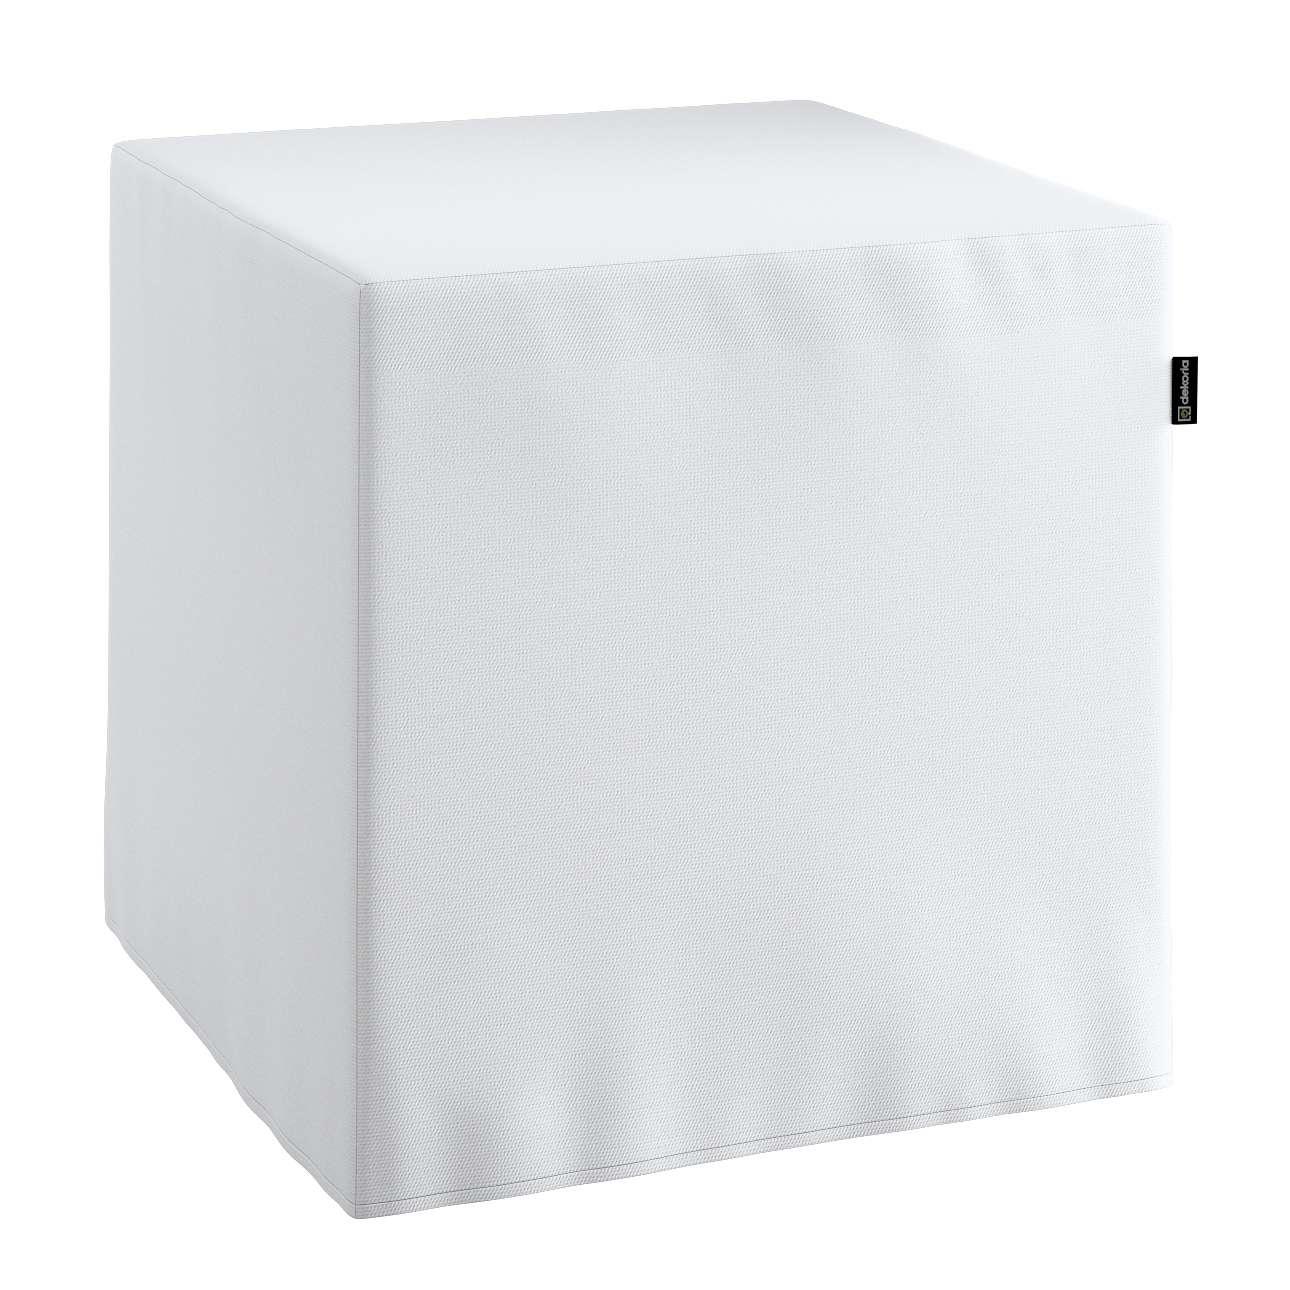 Sedák Cube - kostka pevná 40x40x40 v kolekci Loneta, látka: 133-02